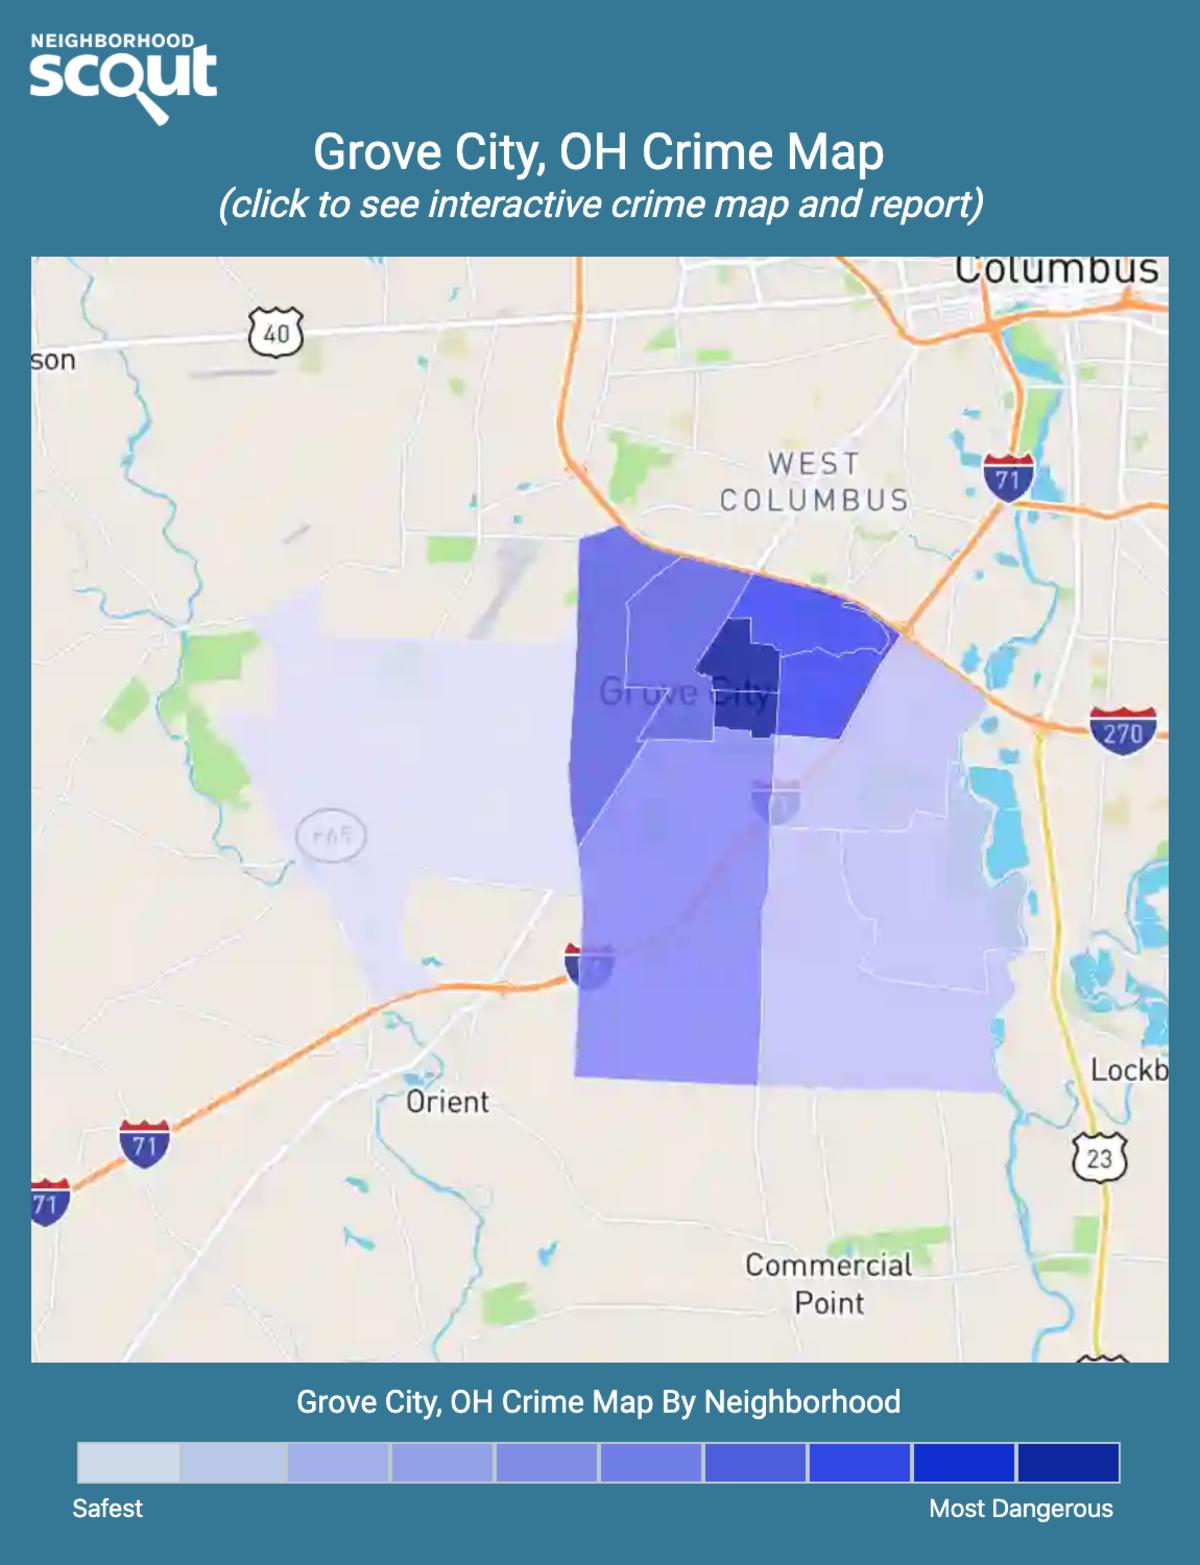 Grove City, Ohio crime map